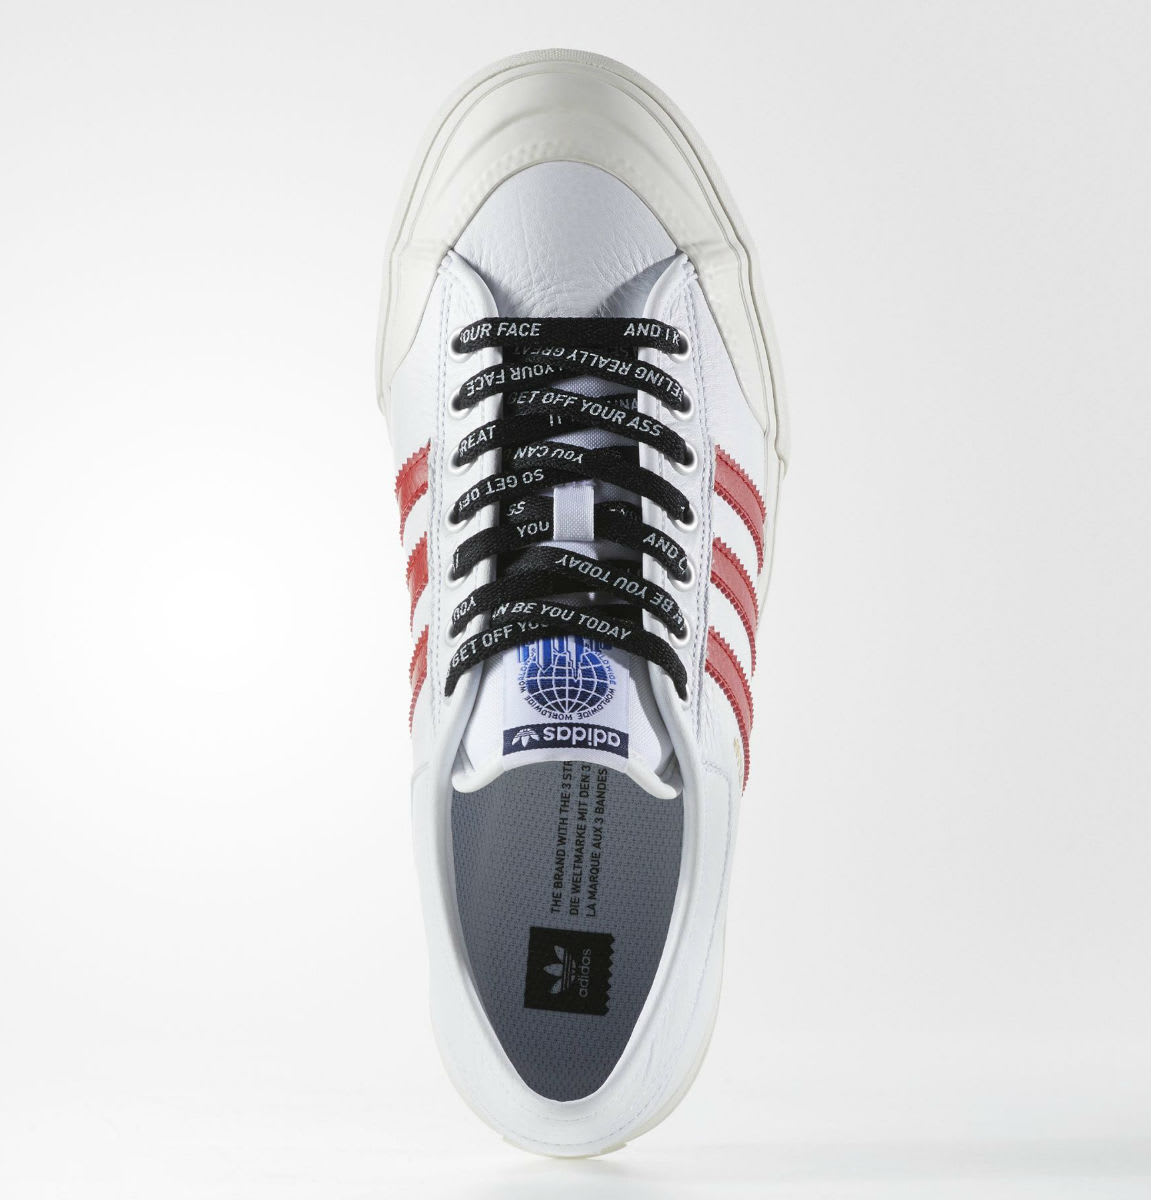 ASAP Ferg Adidas Matchcourt Trap Lord Release Date Top CG5615